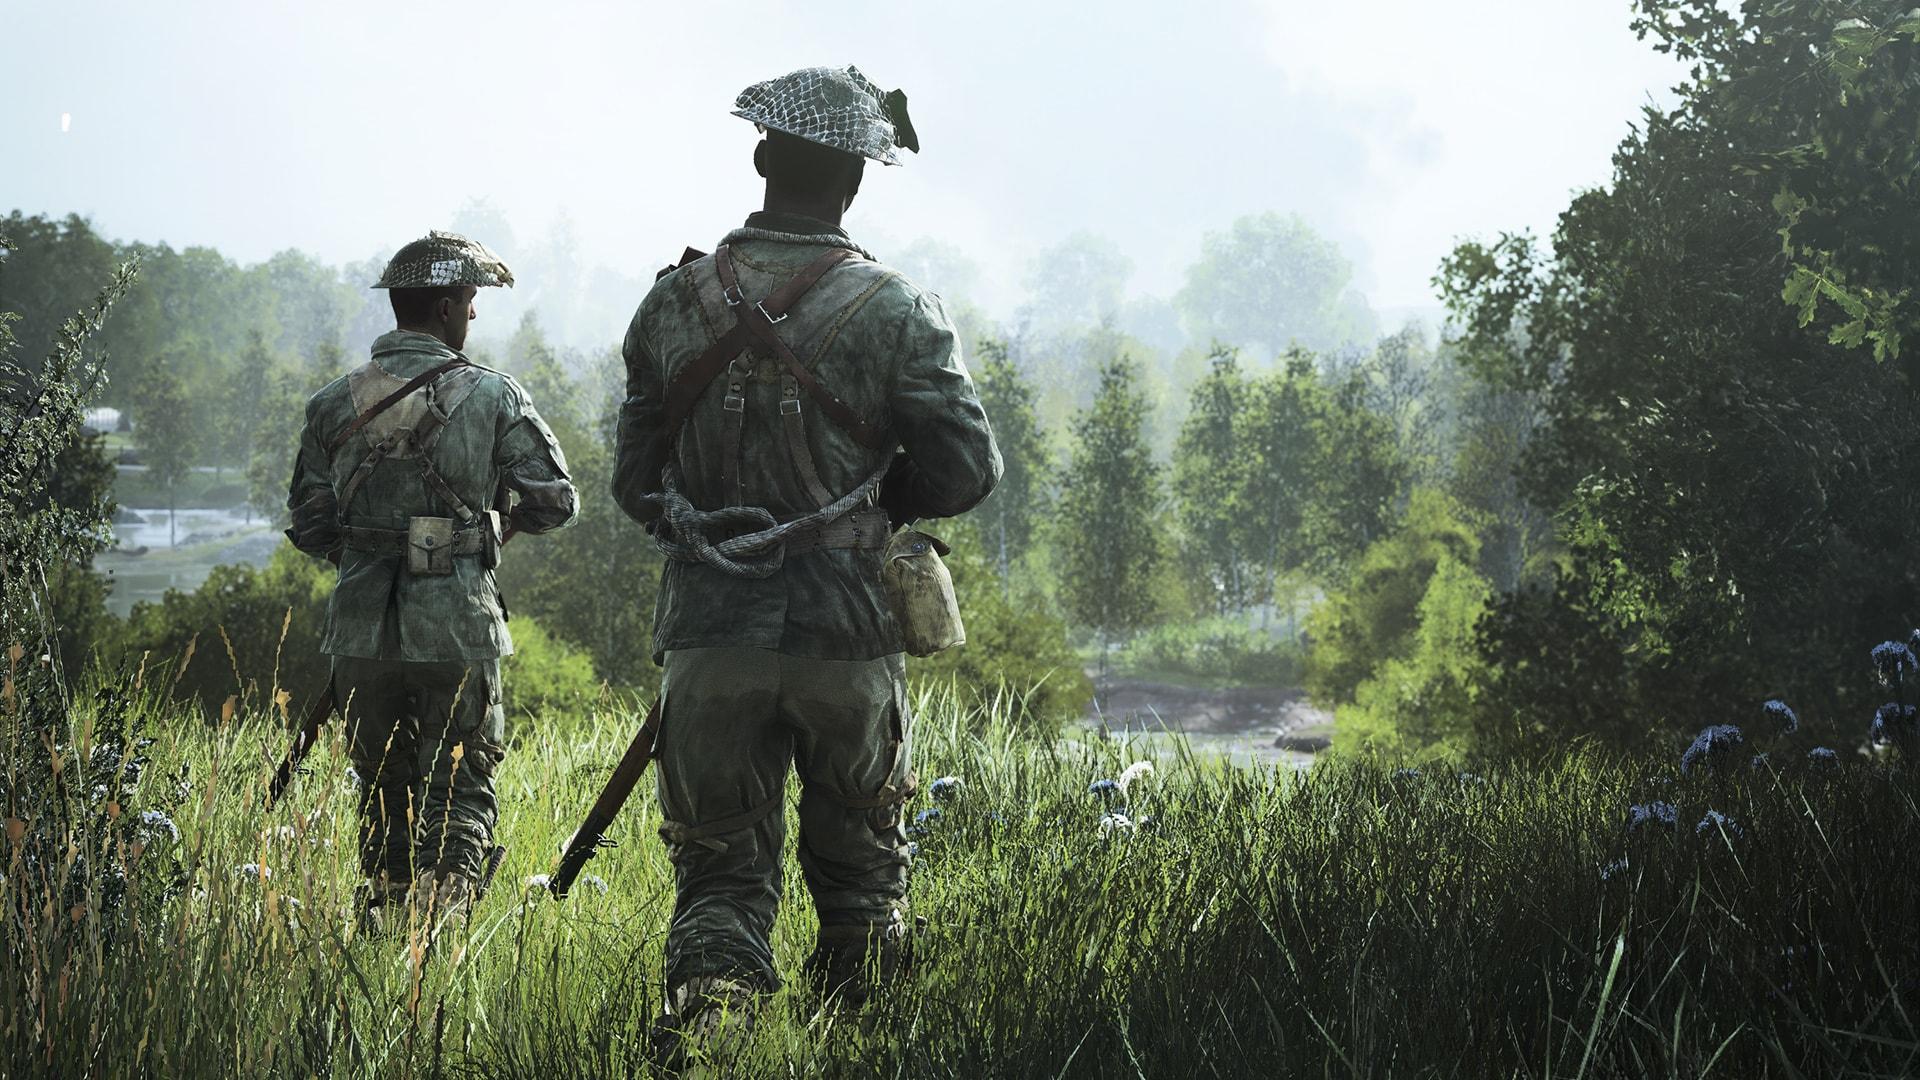 BattlefieldV